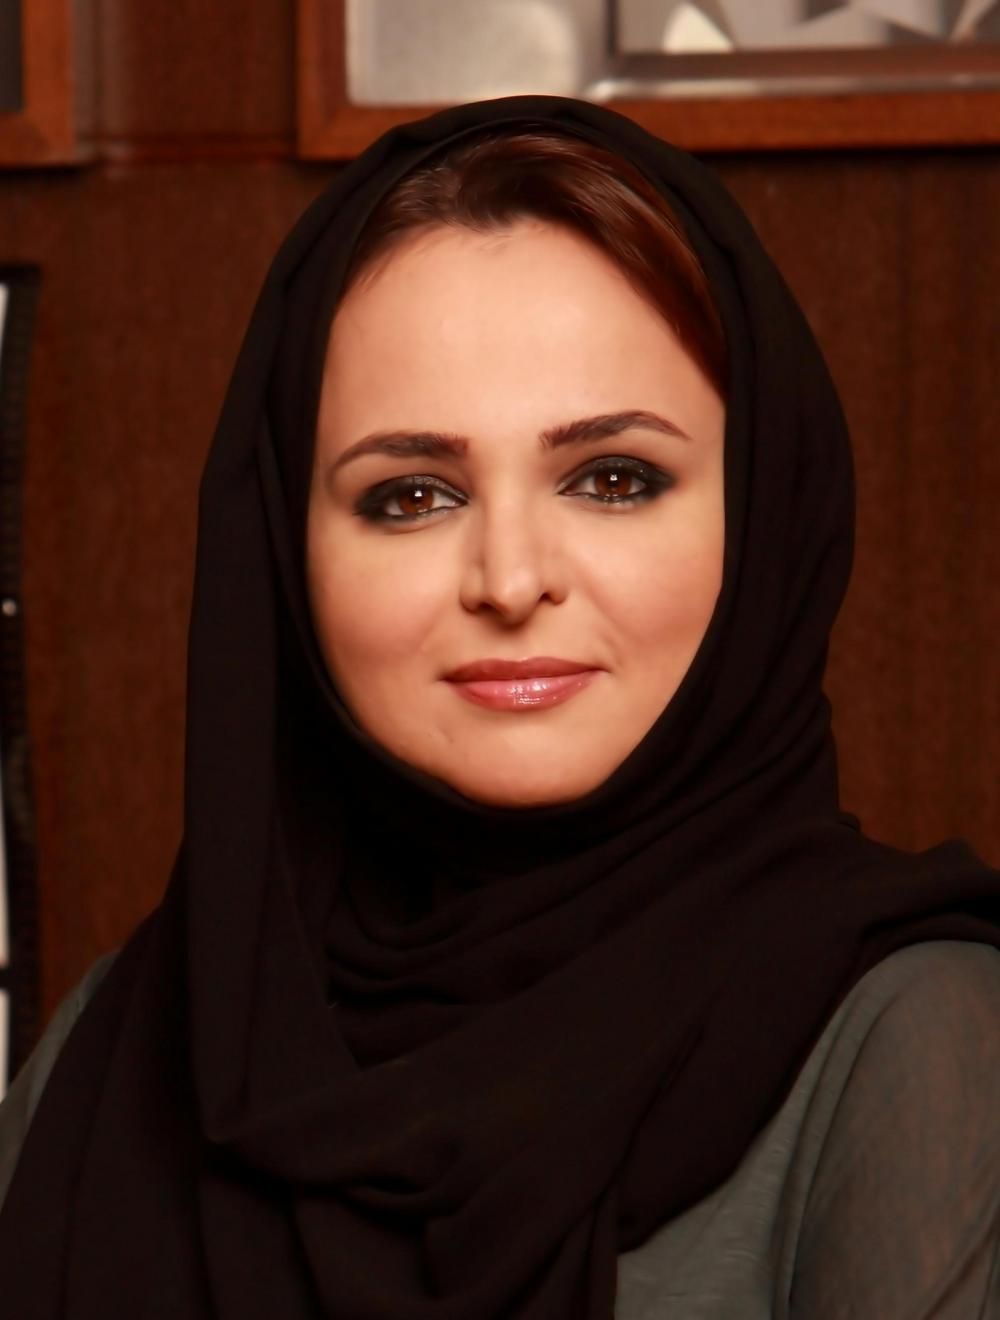 http://images.detik.com/content/2013/05/24/68/143411_arab004.jpg